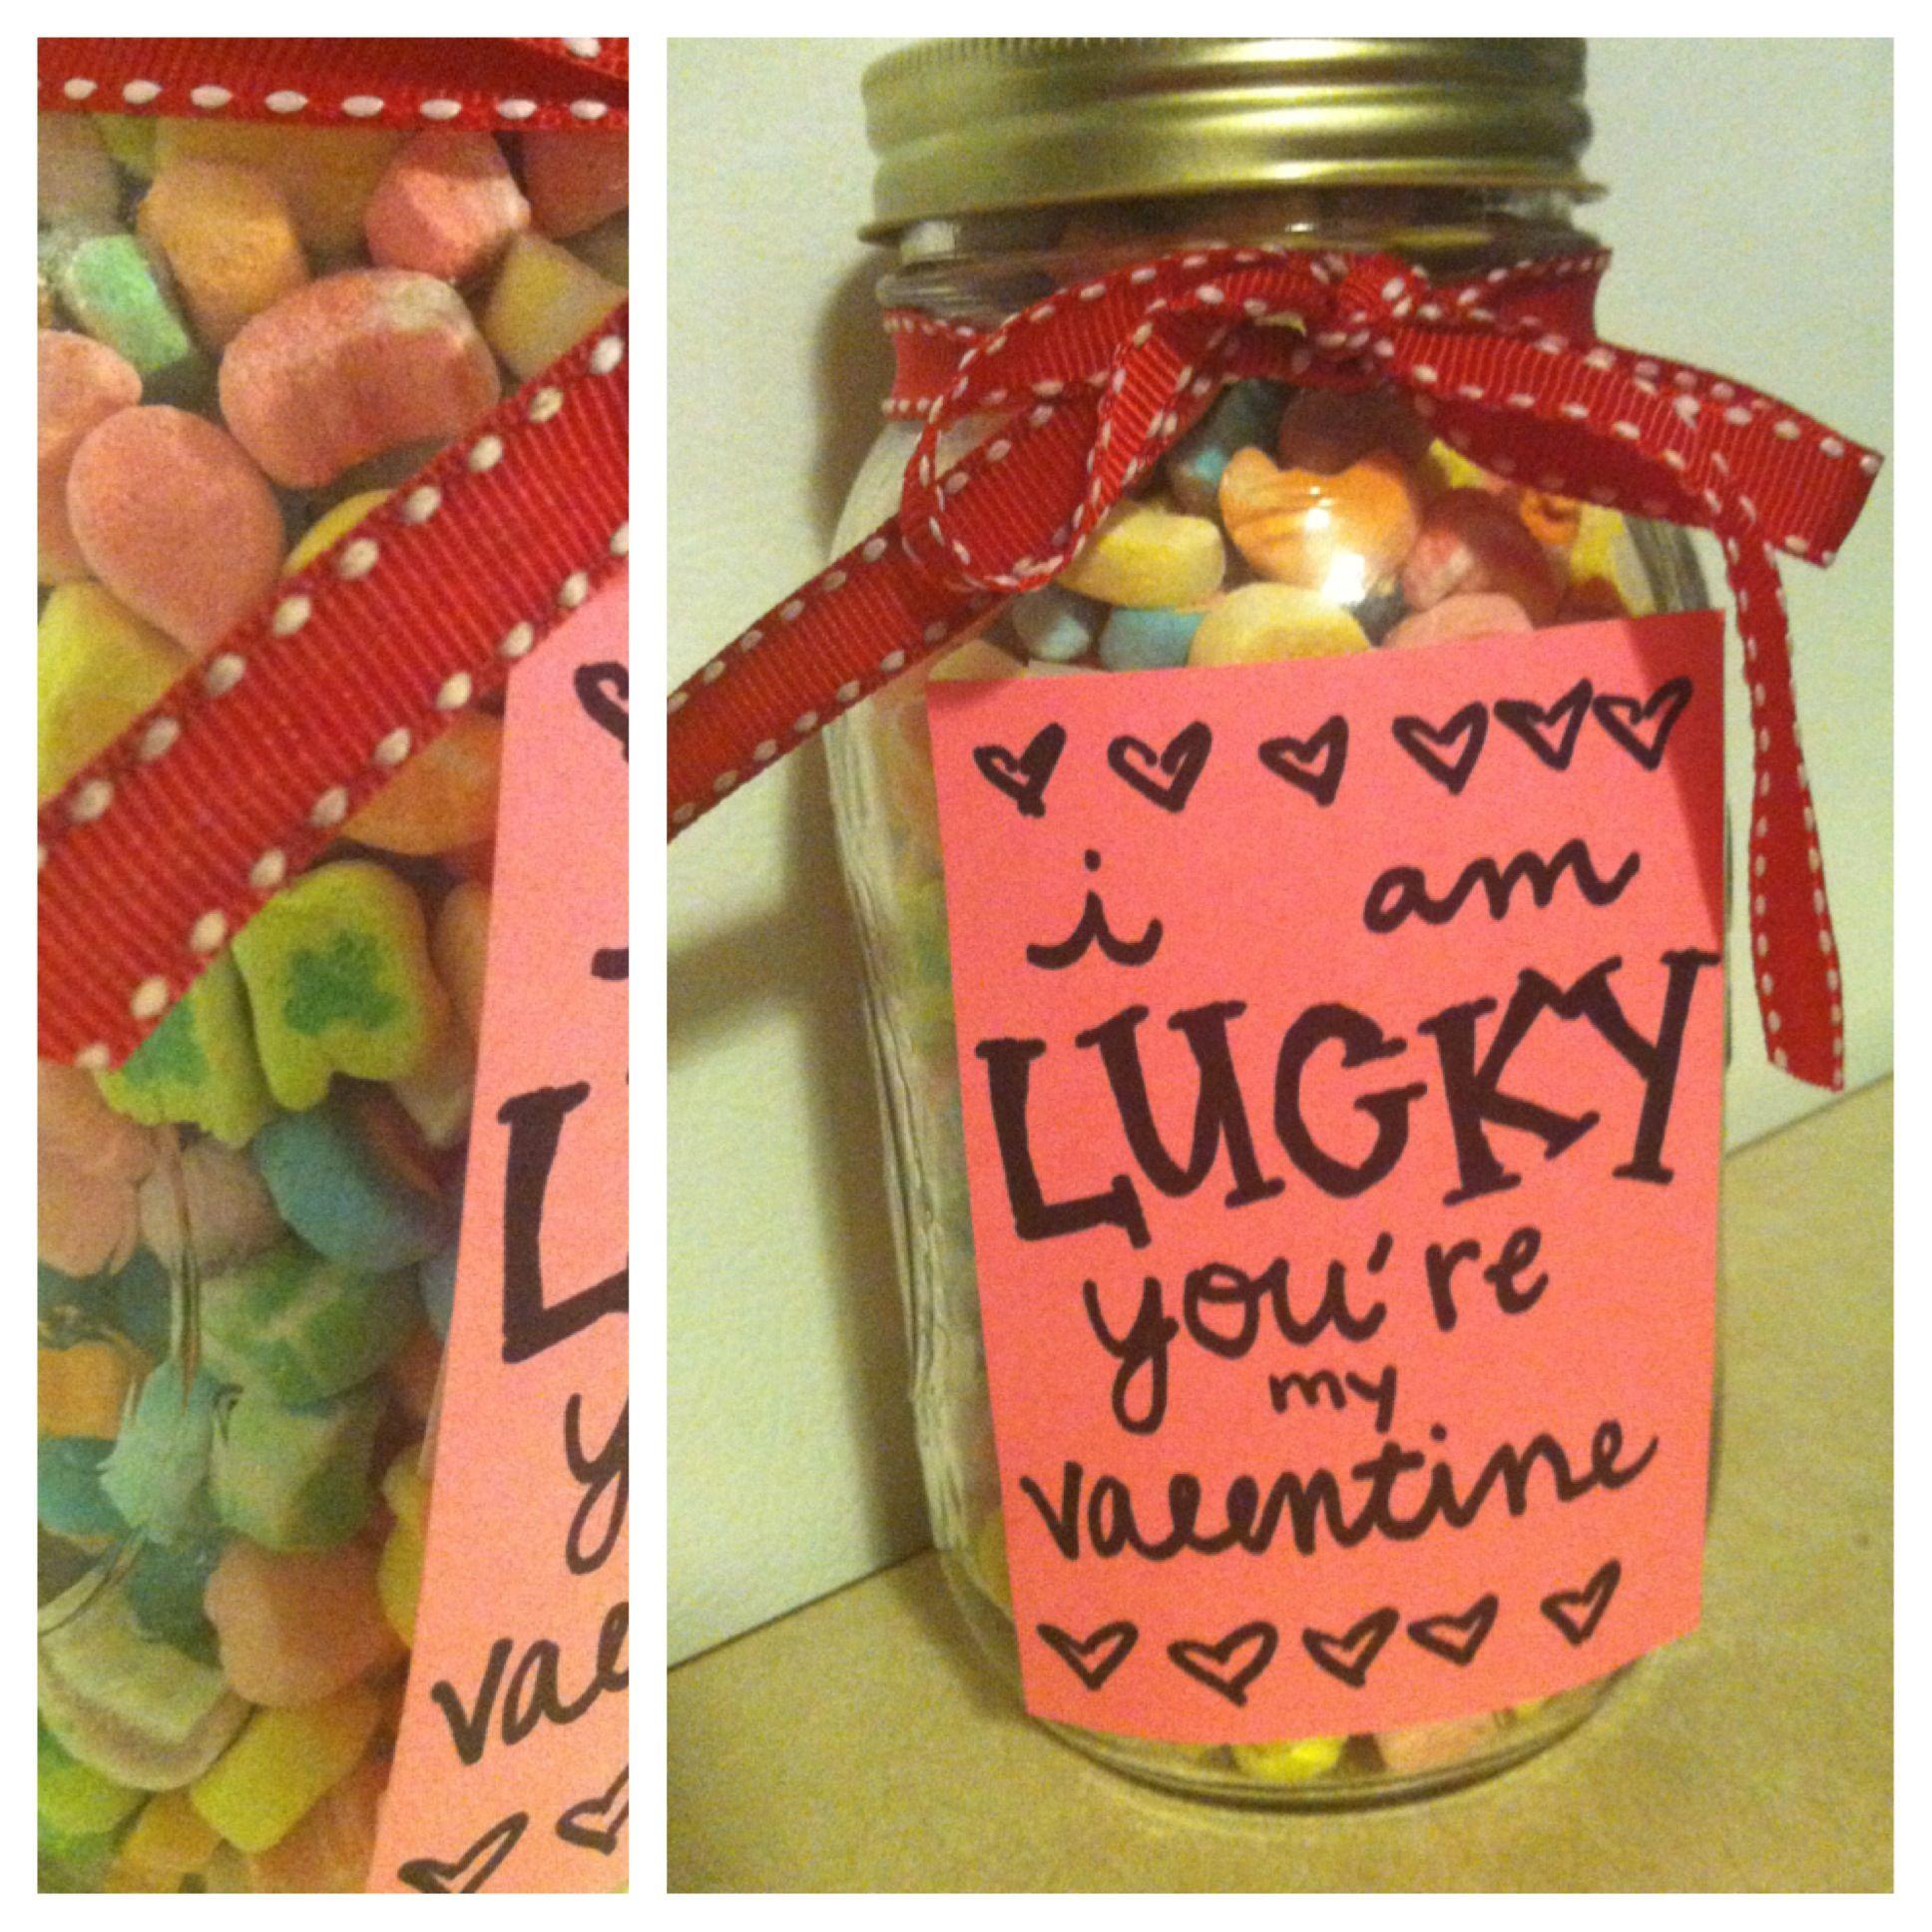 Cute Valentine Gift Ideas For My Boyfriend Gift Ideas: A Super Cute Valentines Gift Idea. Made This For My